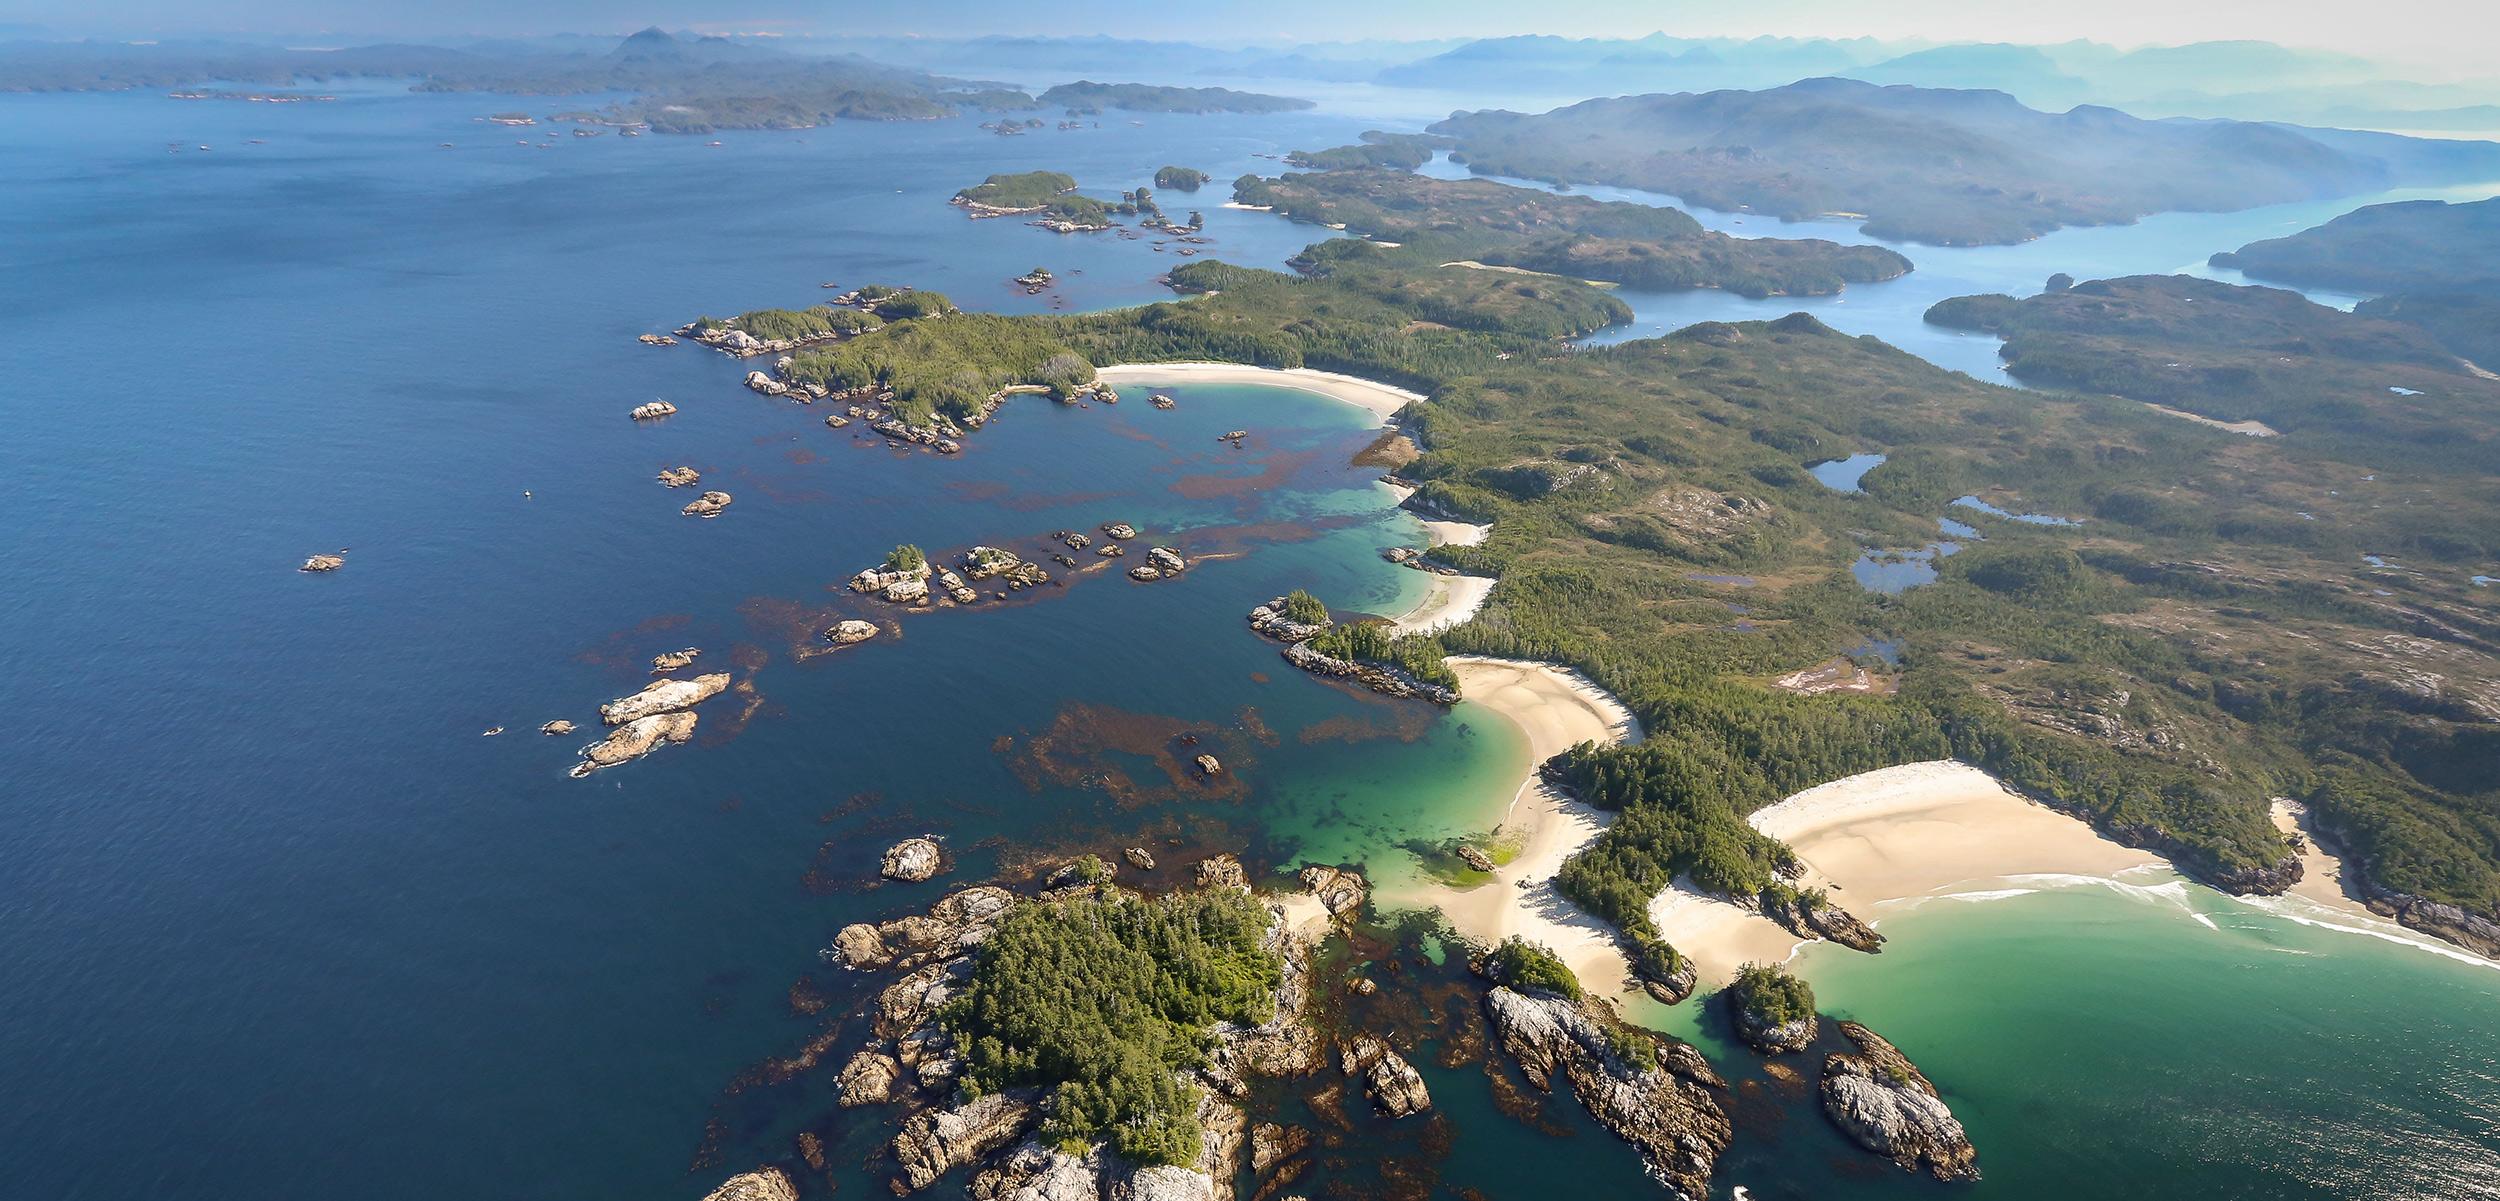 Calvert Island on the Central Coast of British Columbia, Canada